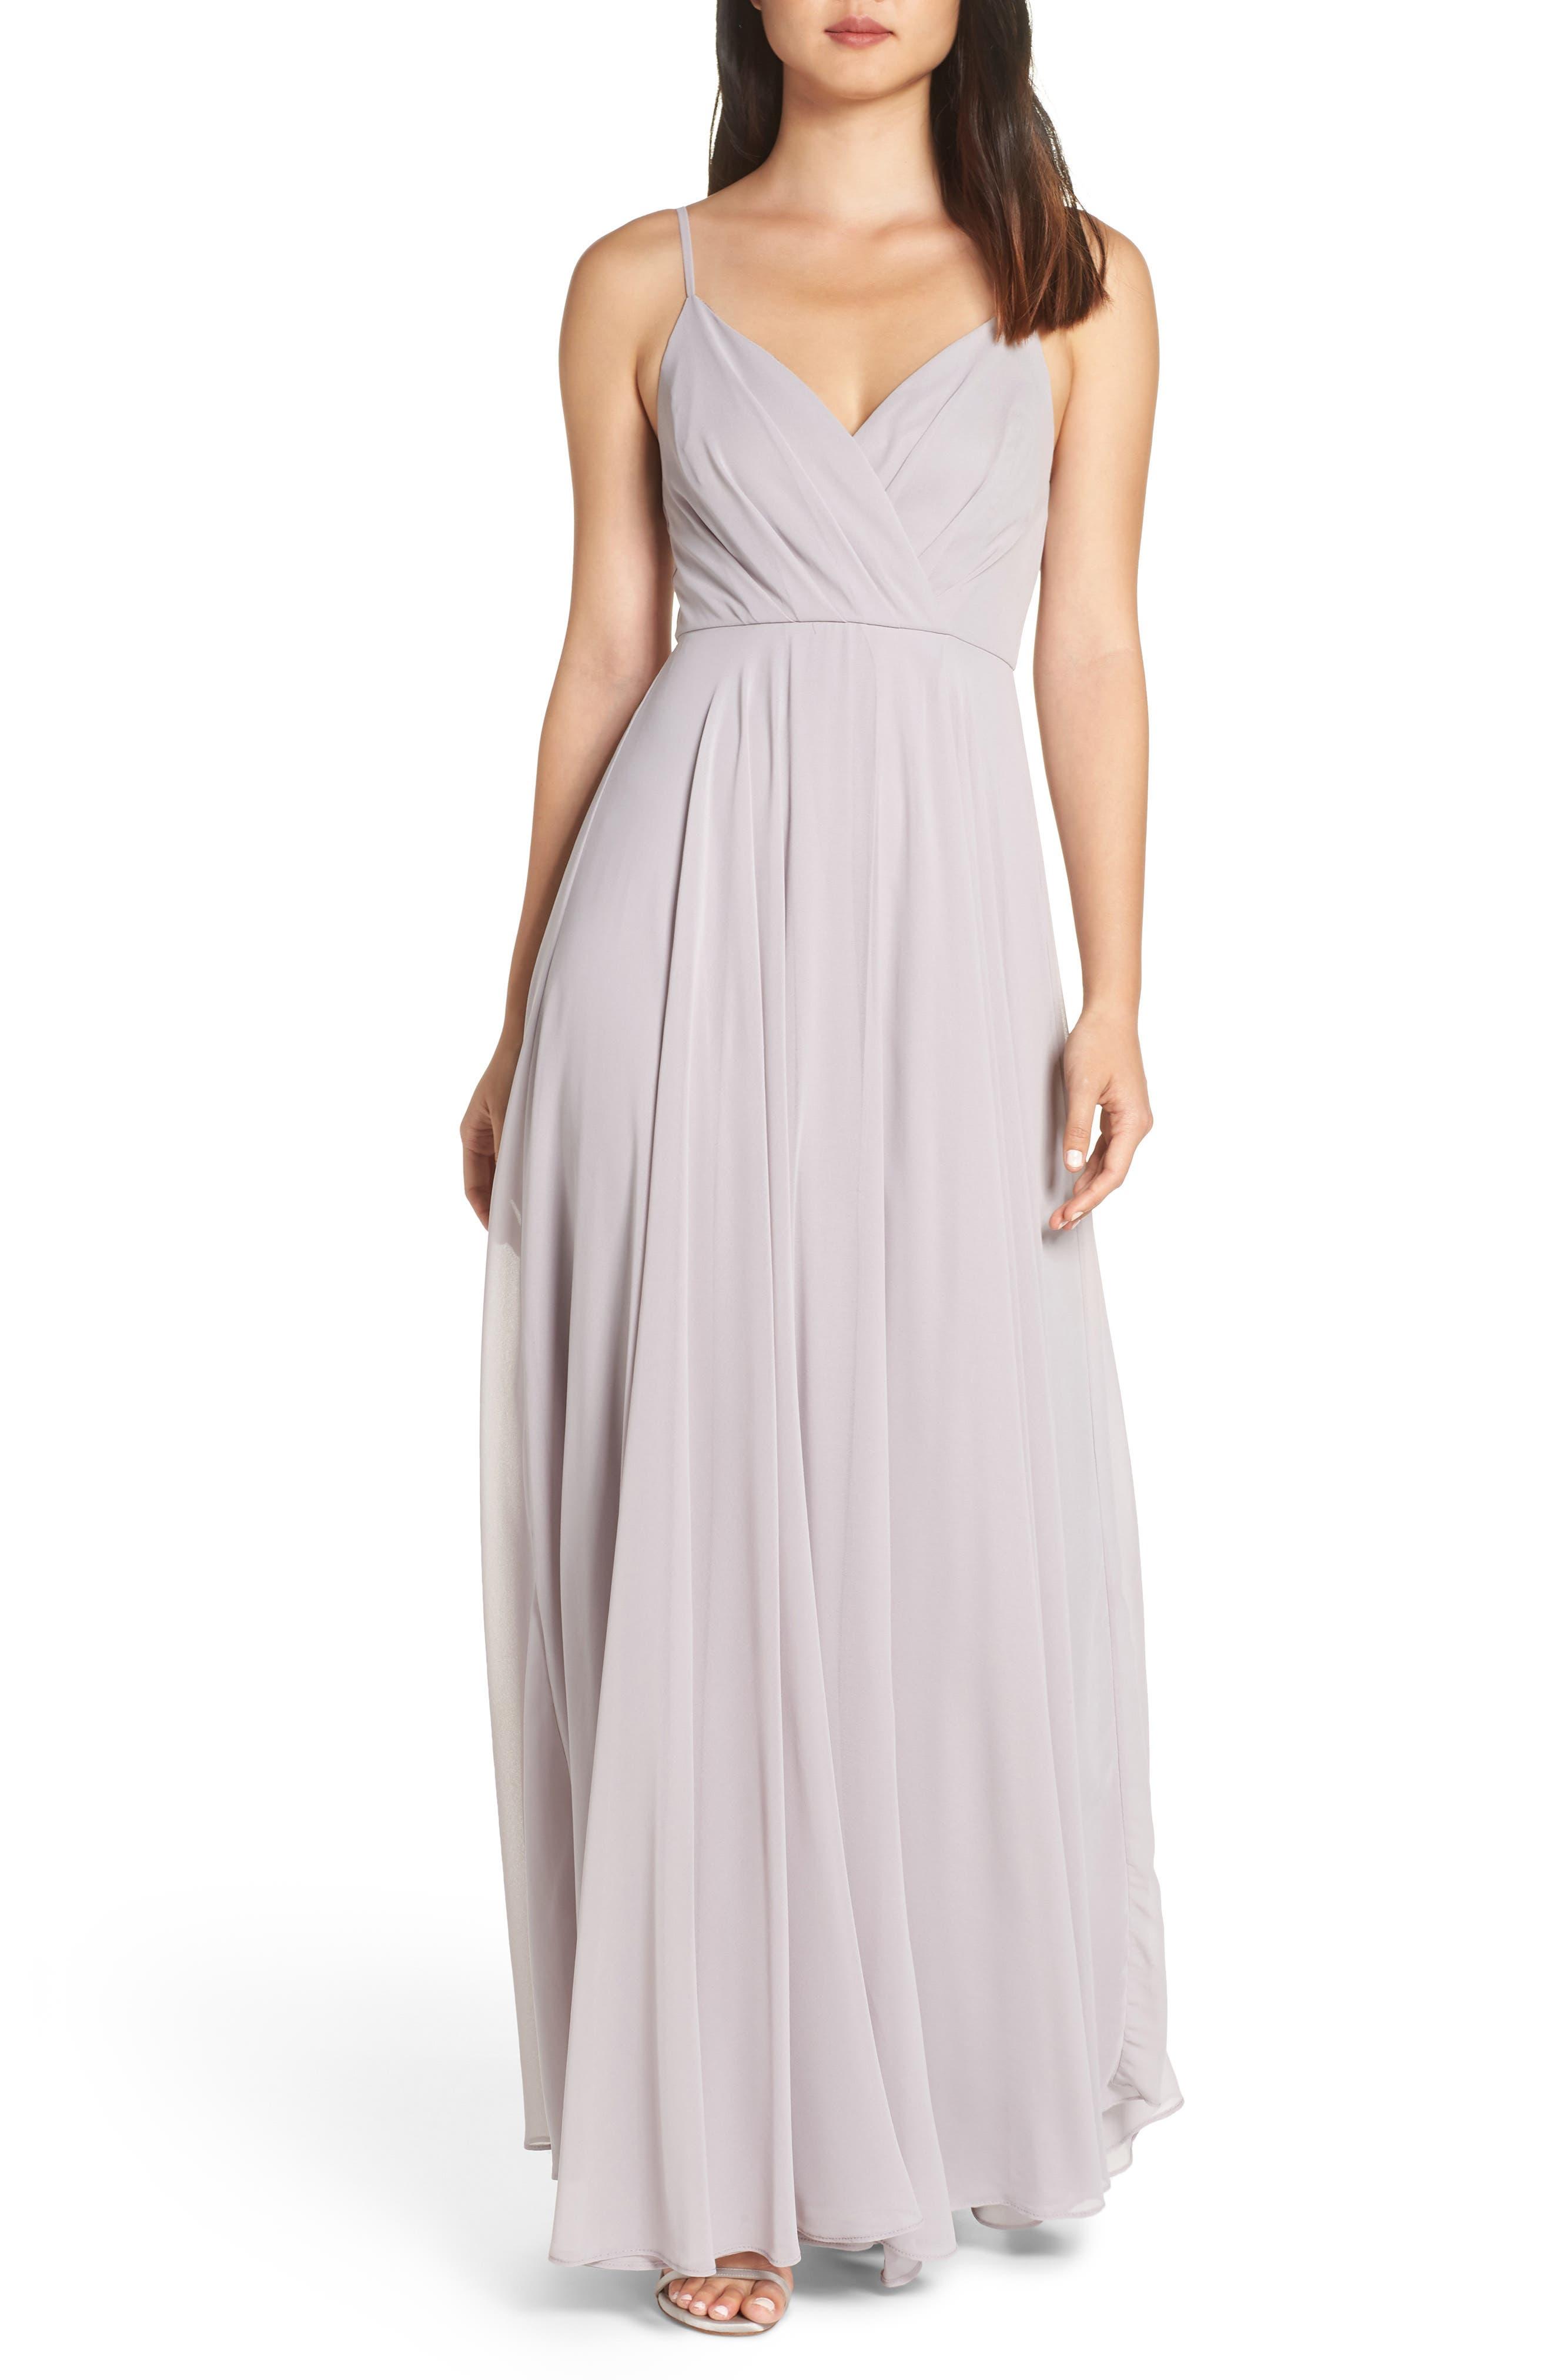 LULUS Surplice Chiffon Gown, Main, color, LIGHT GREY